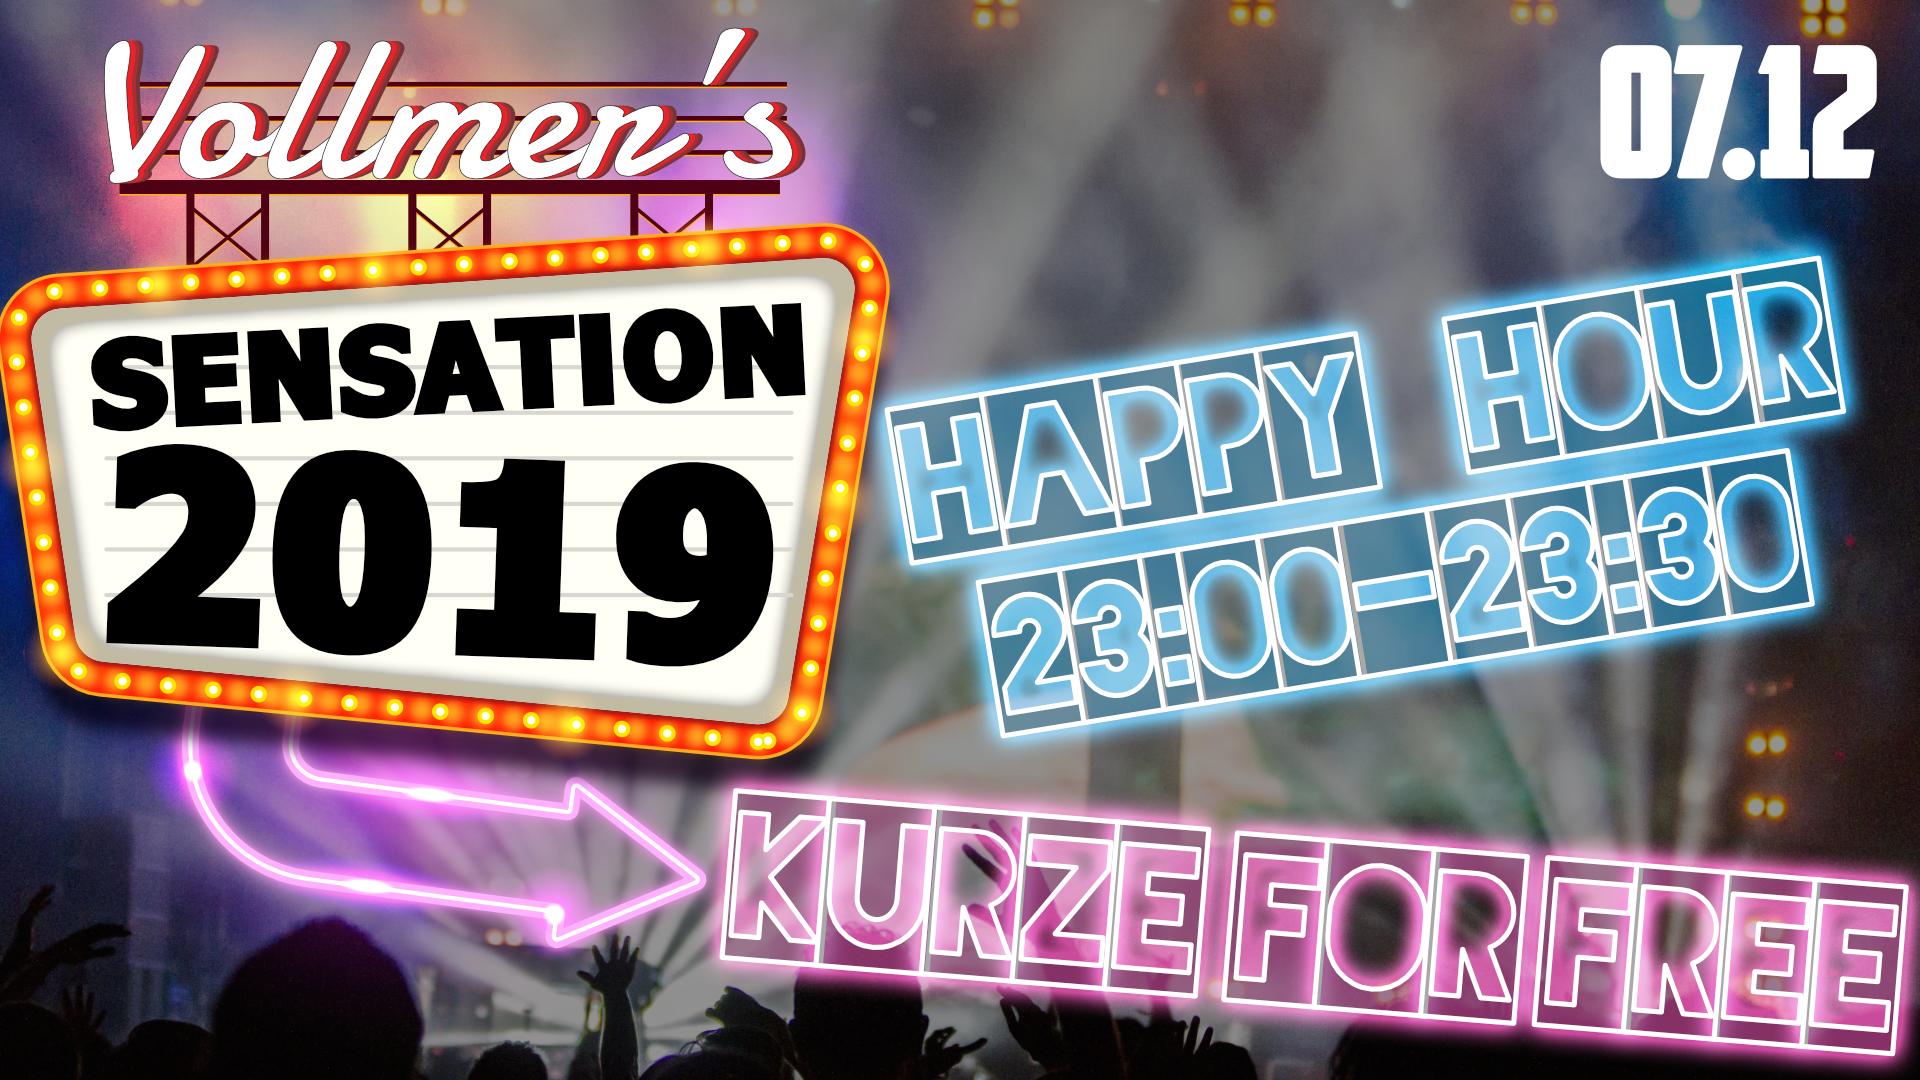 Vollmer's Sensation - 2019